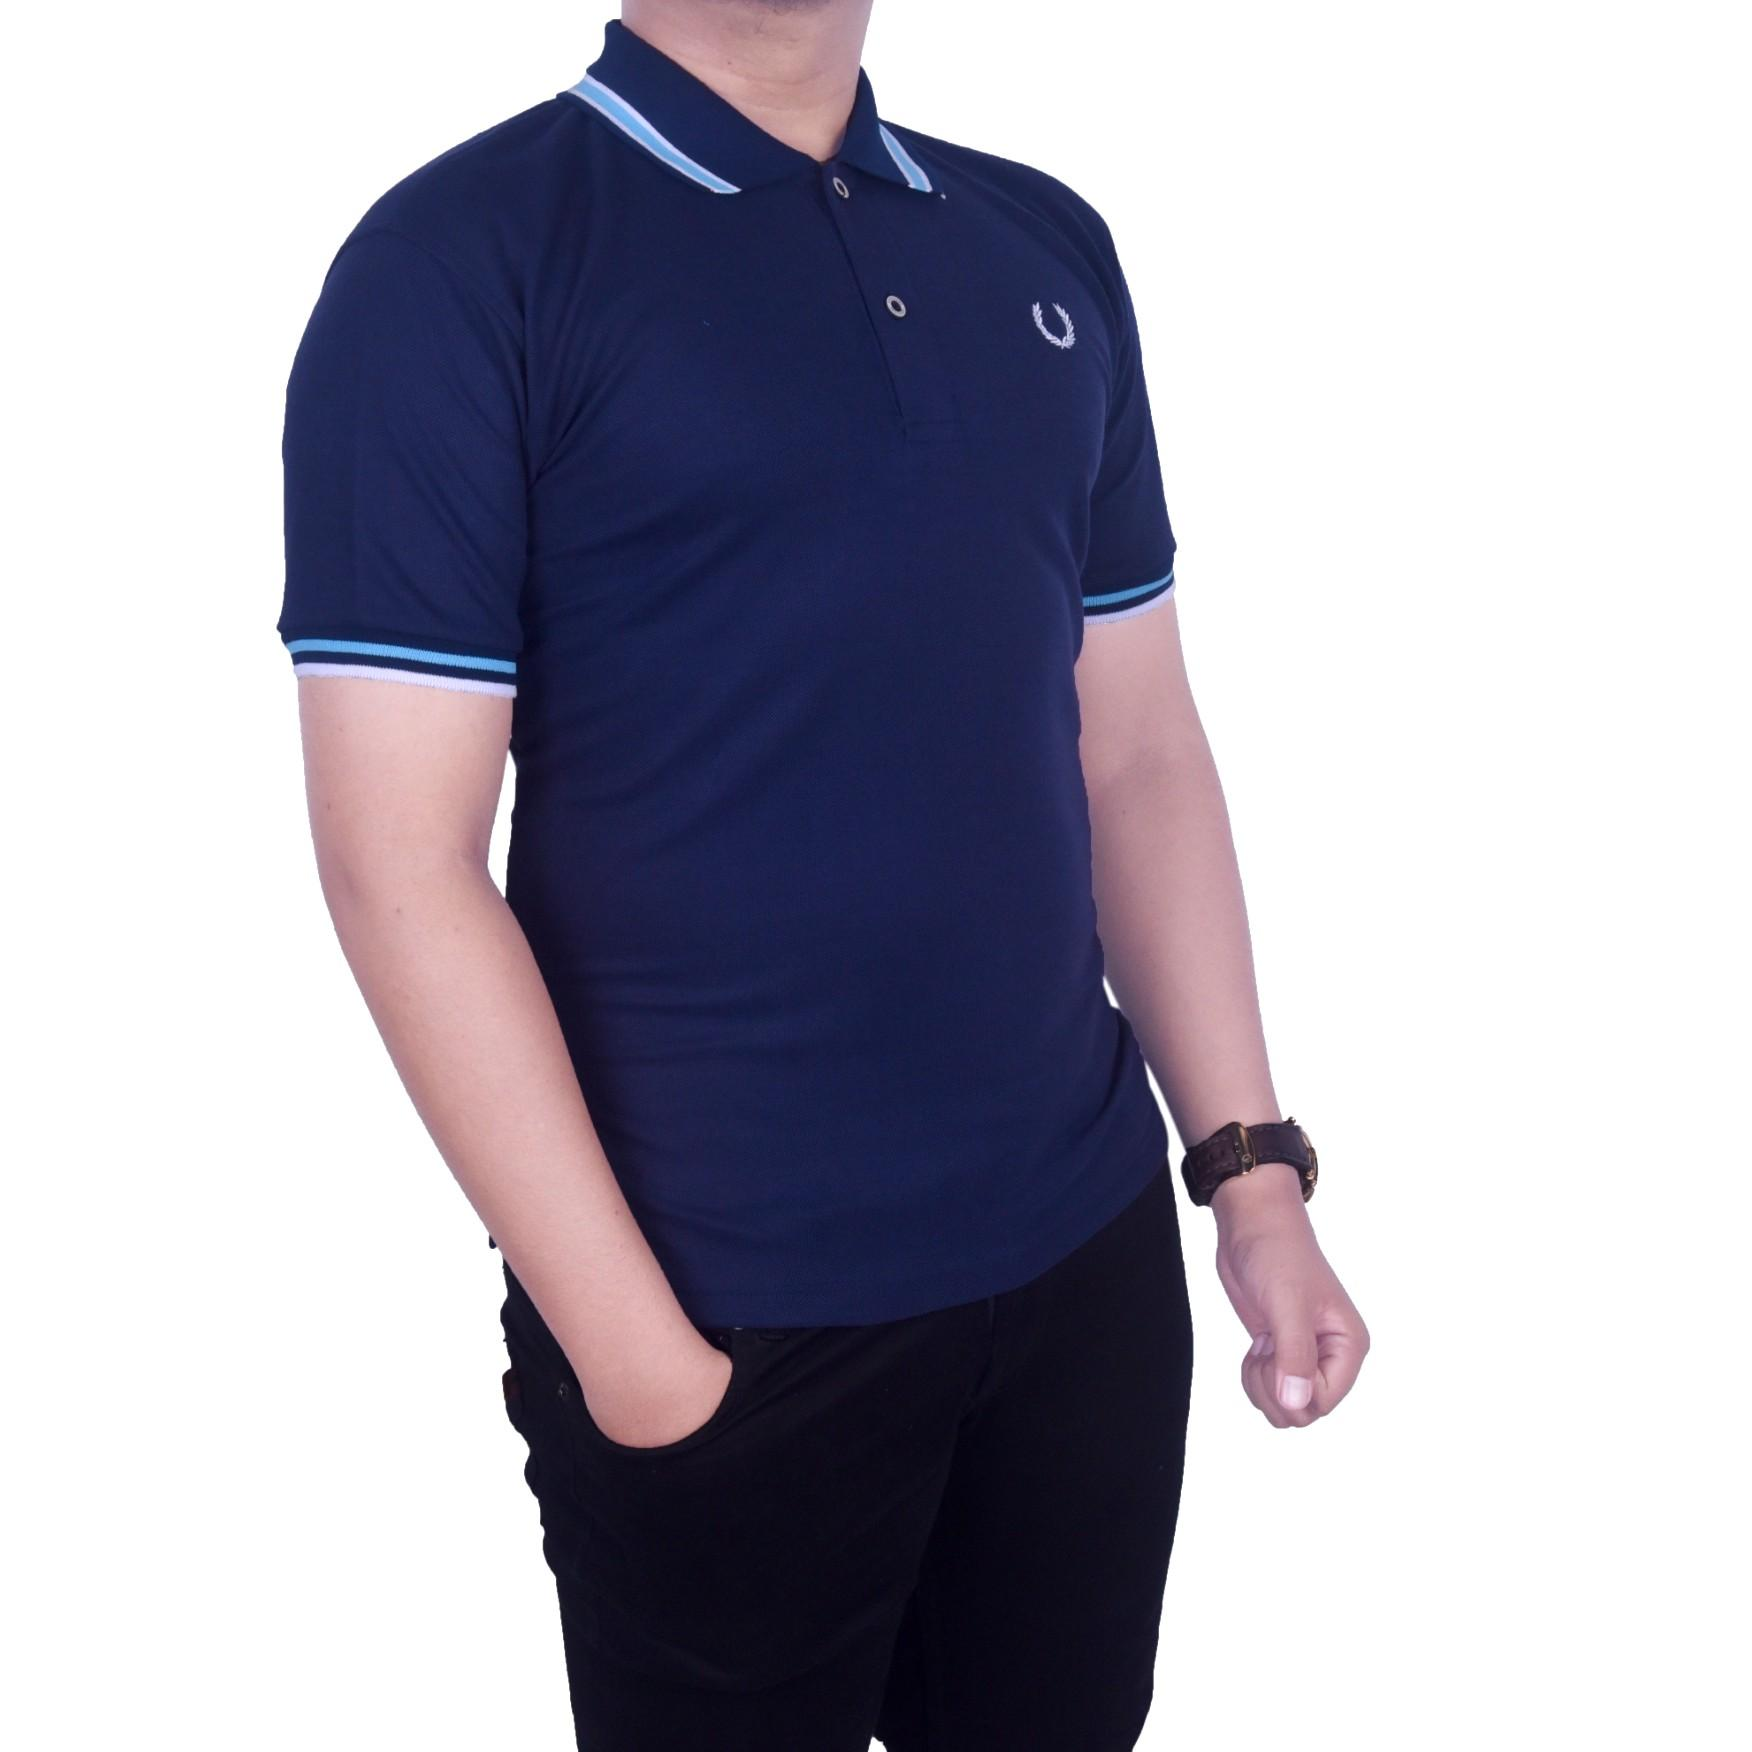 Polo Shirt Pria Terbaru Murah Kaos Kerah Bahan Lacoste Pique Tebal Dgm Fashion1 Polos Navy Kombinasi